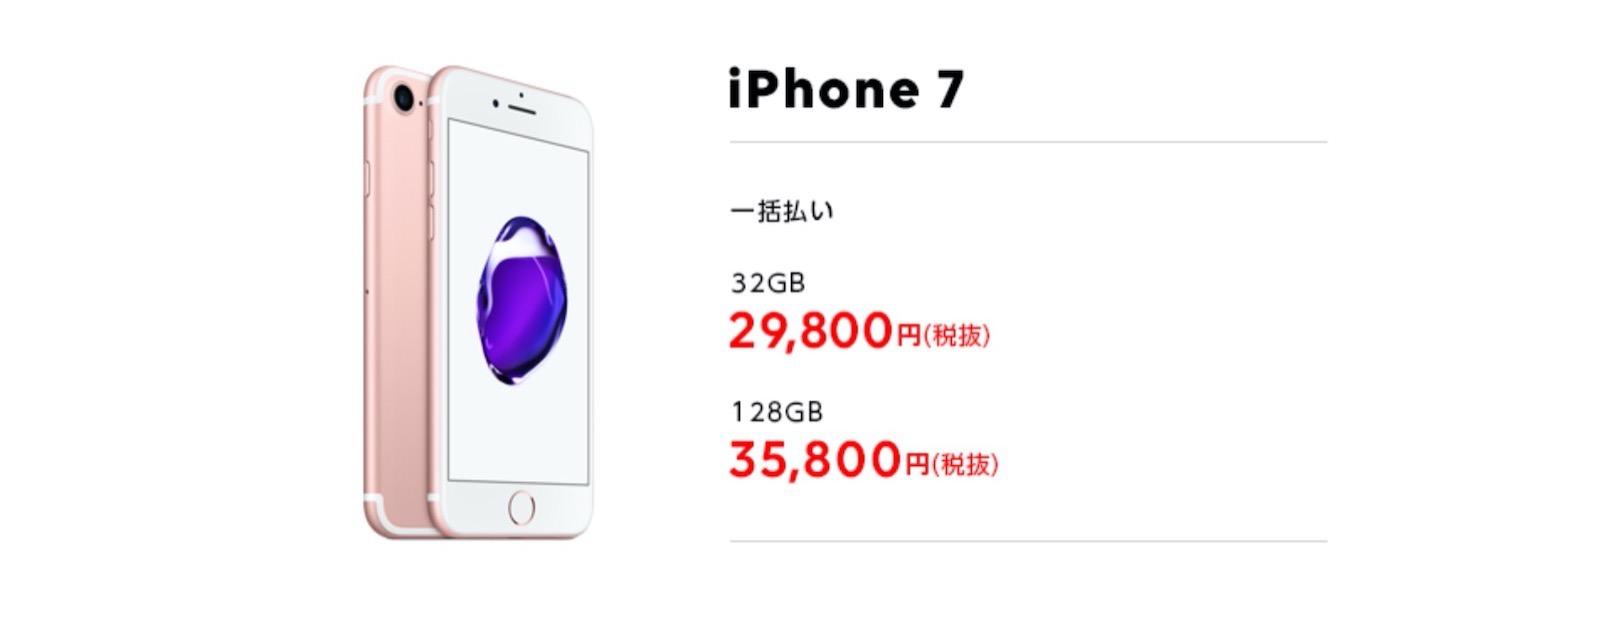 Iphone 7 line mobile sale